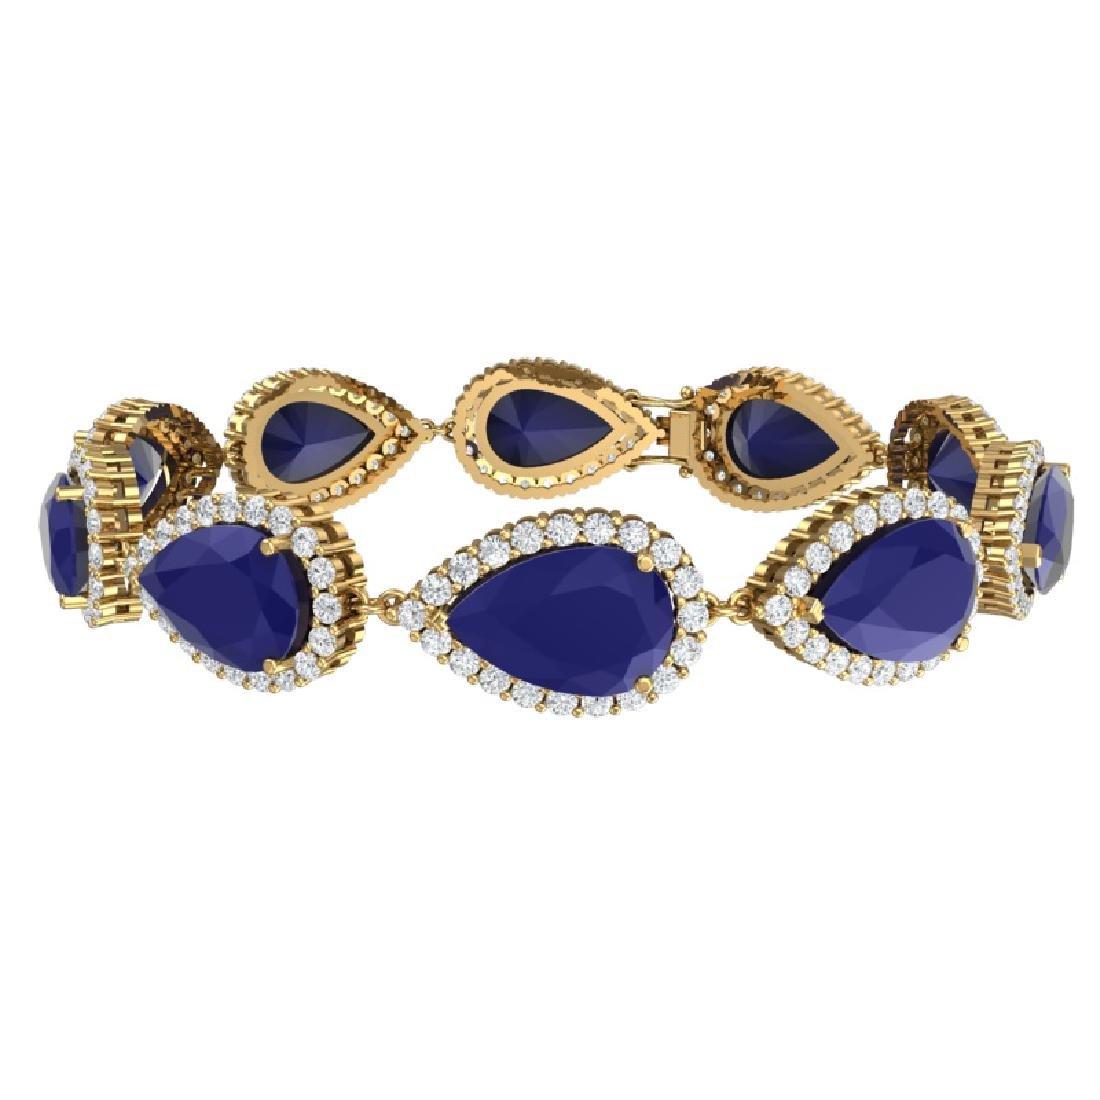 42 CTW Royalty Sapphire & VS Diamond Bracelet 18K - 3